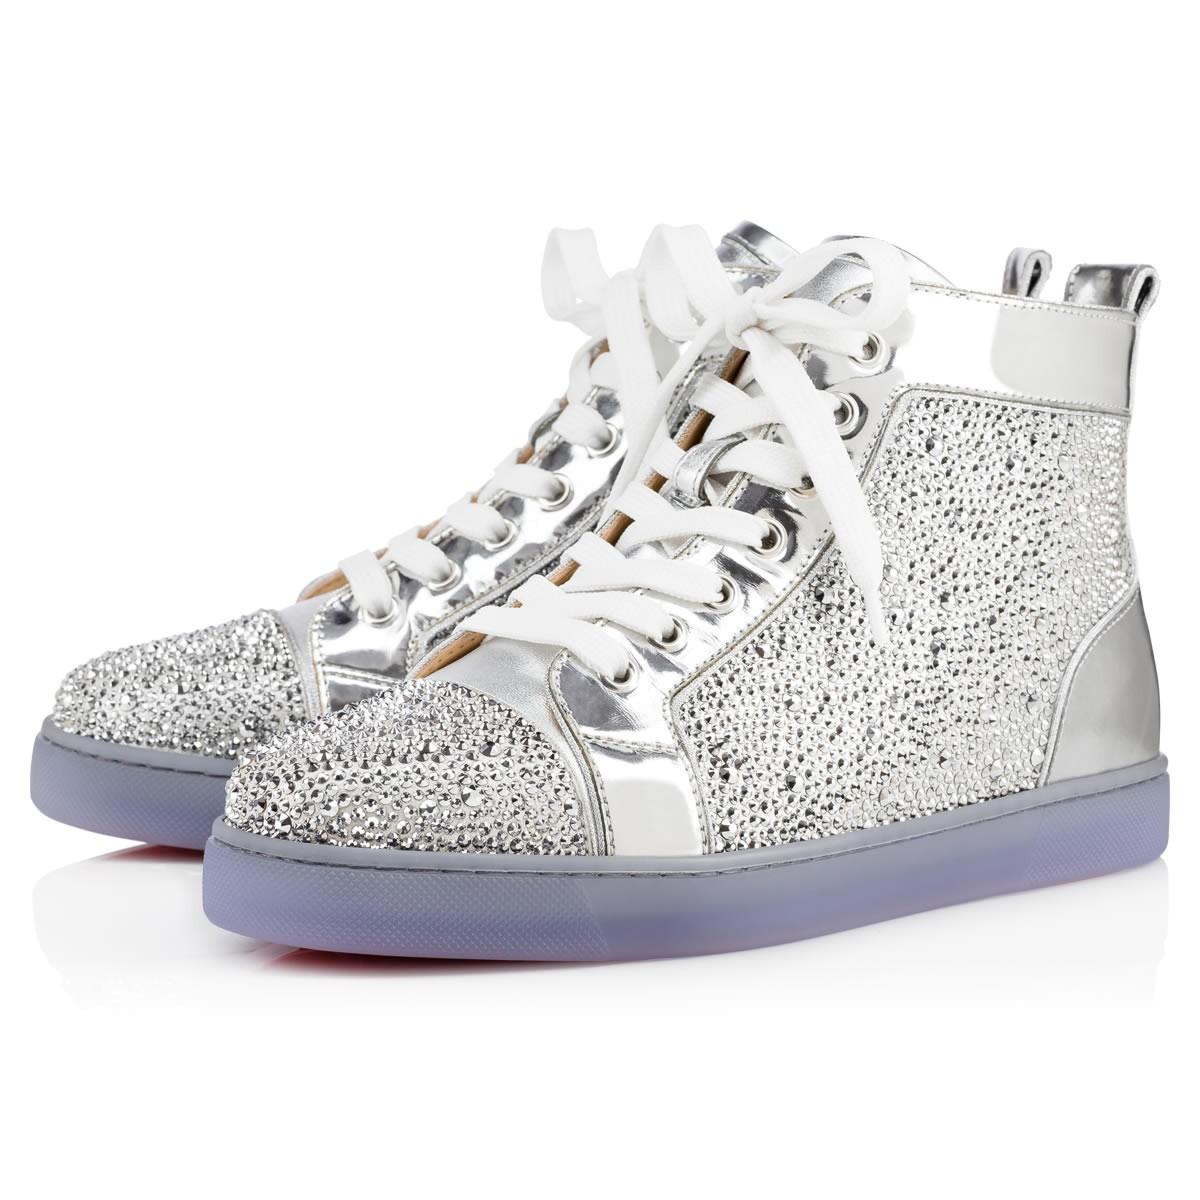 tout neuf c9c87 ab7e0 Louis Strass Women's Flat Version Silver Strass - Women Shoes - Christian  Louboutin